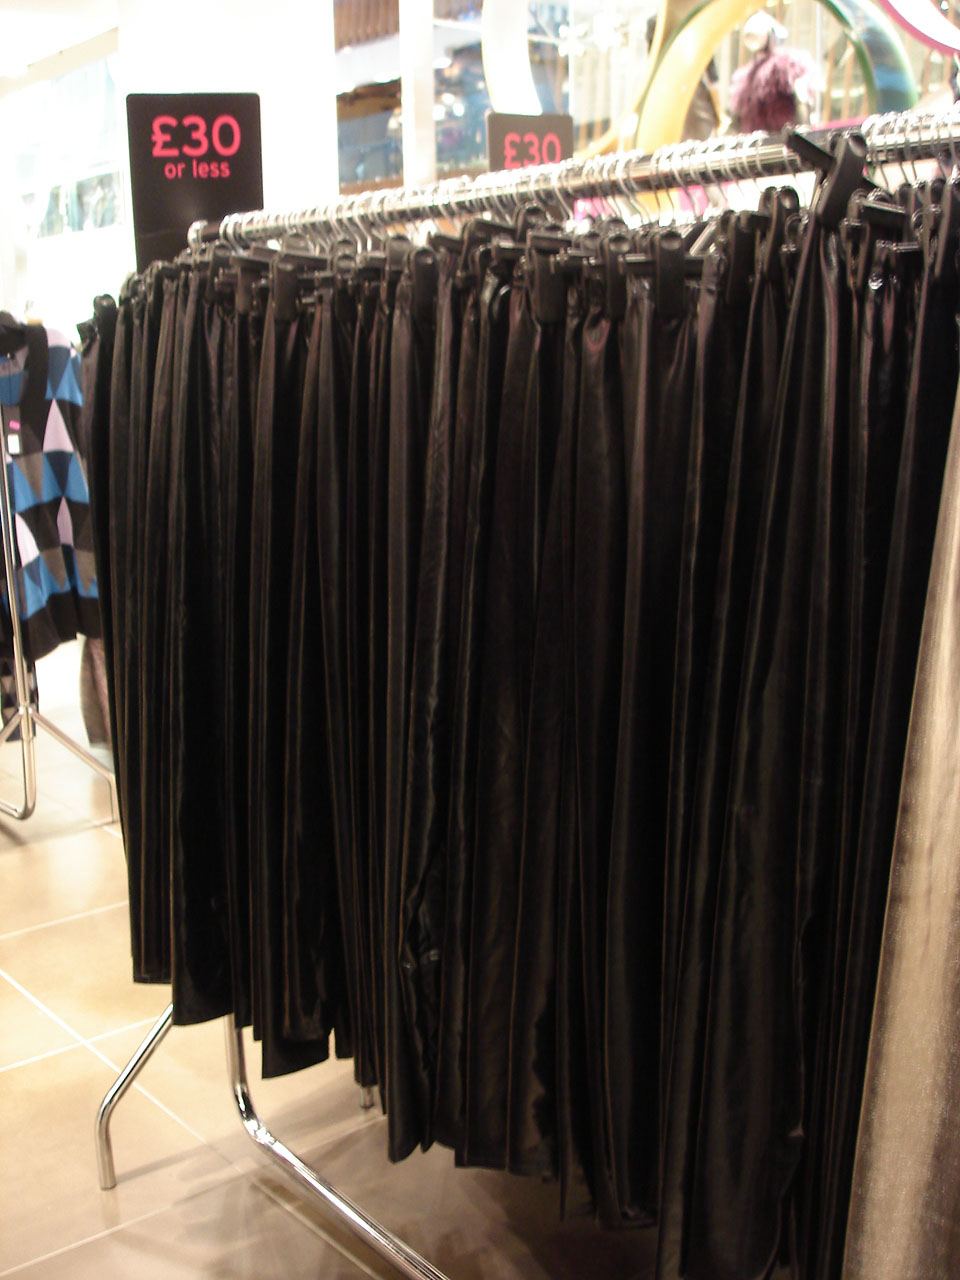 Oil slick at Topshop?  Half price wet look leggings